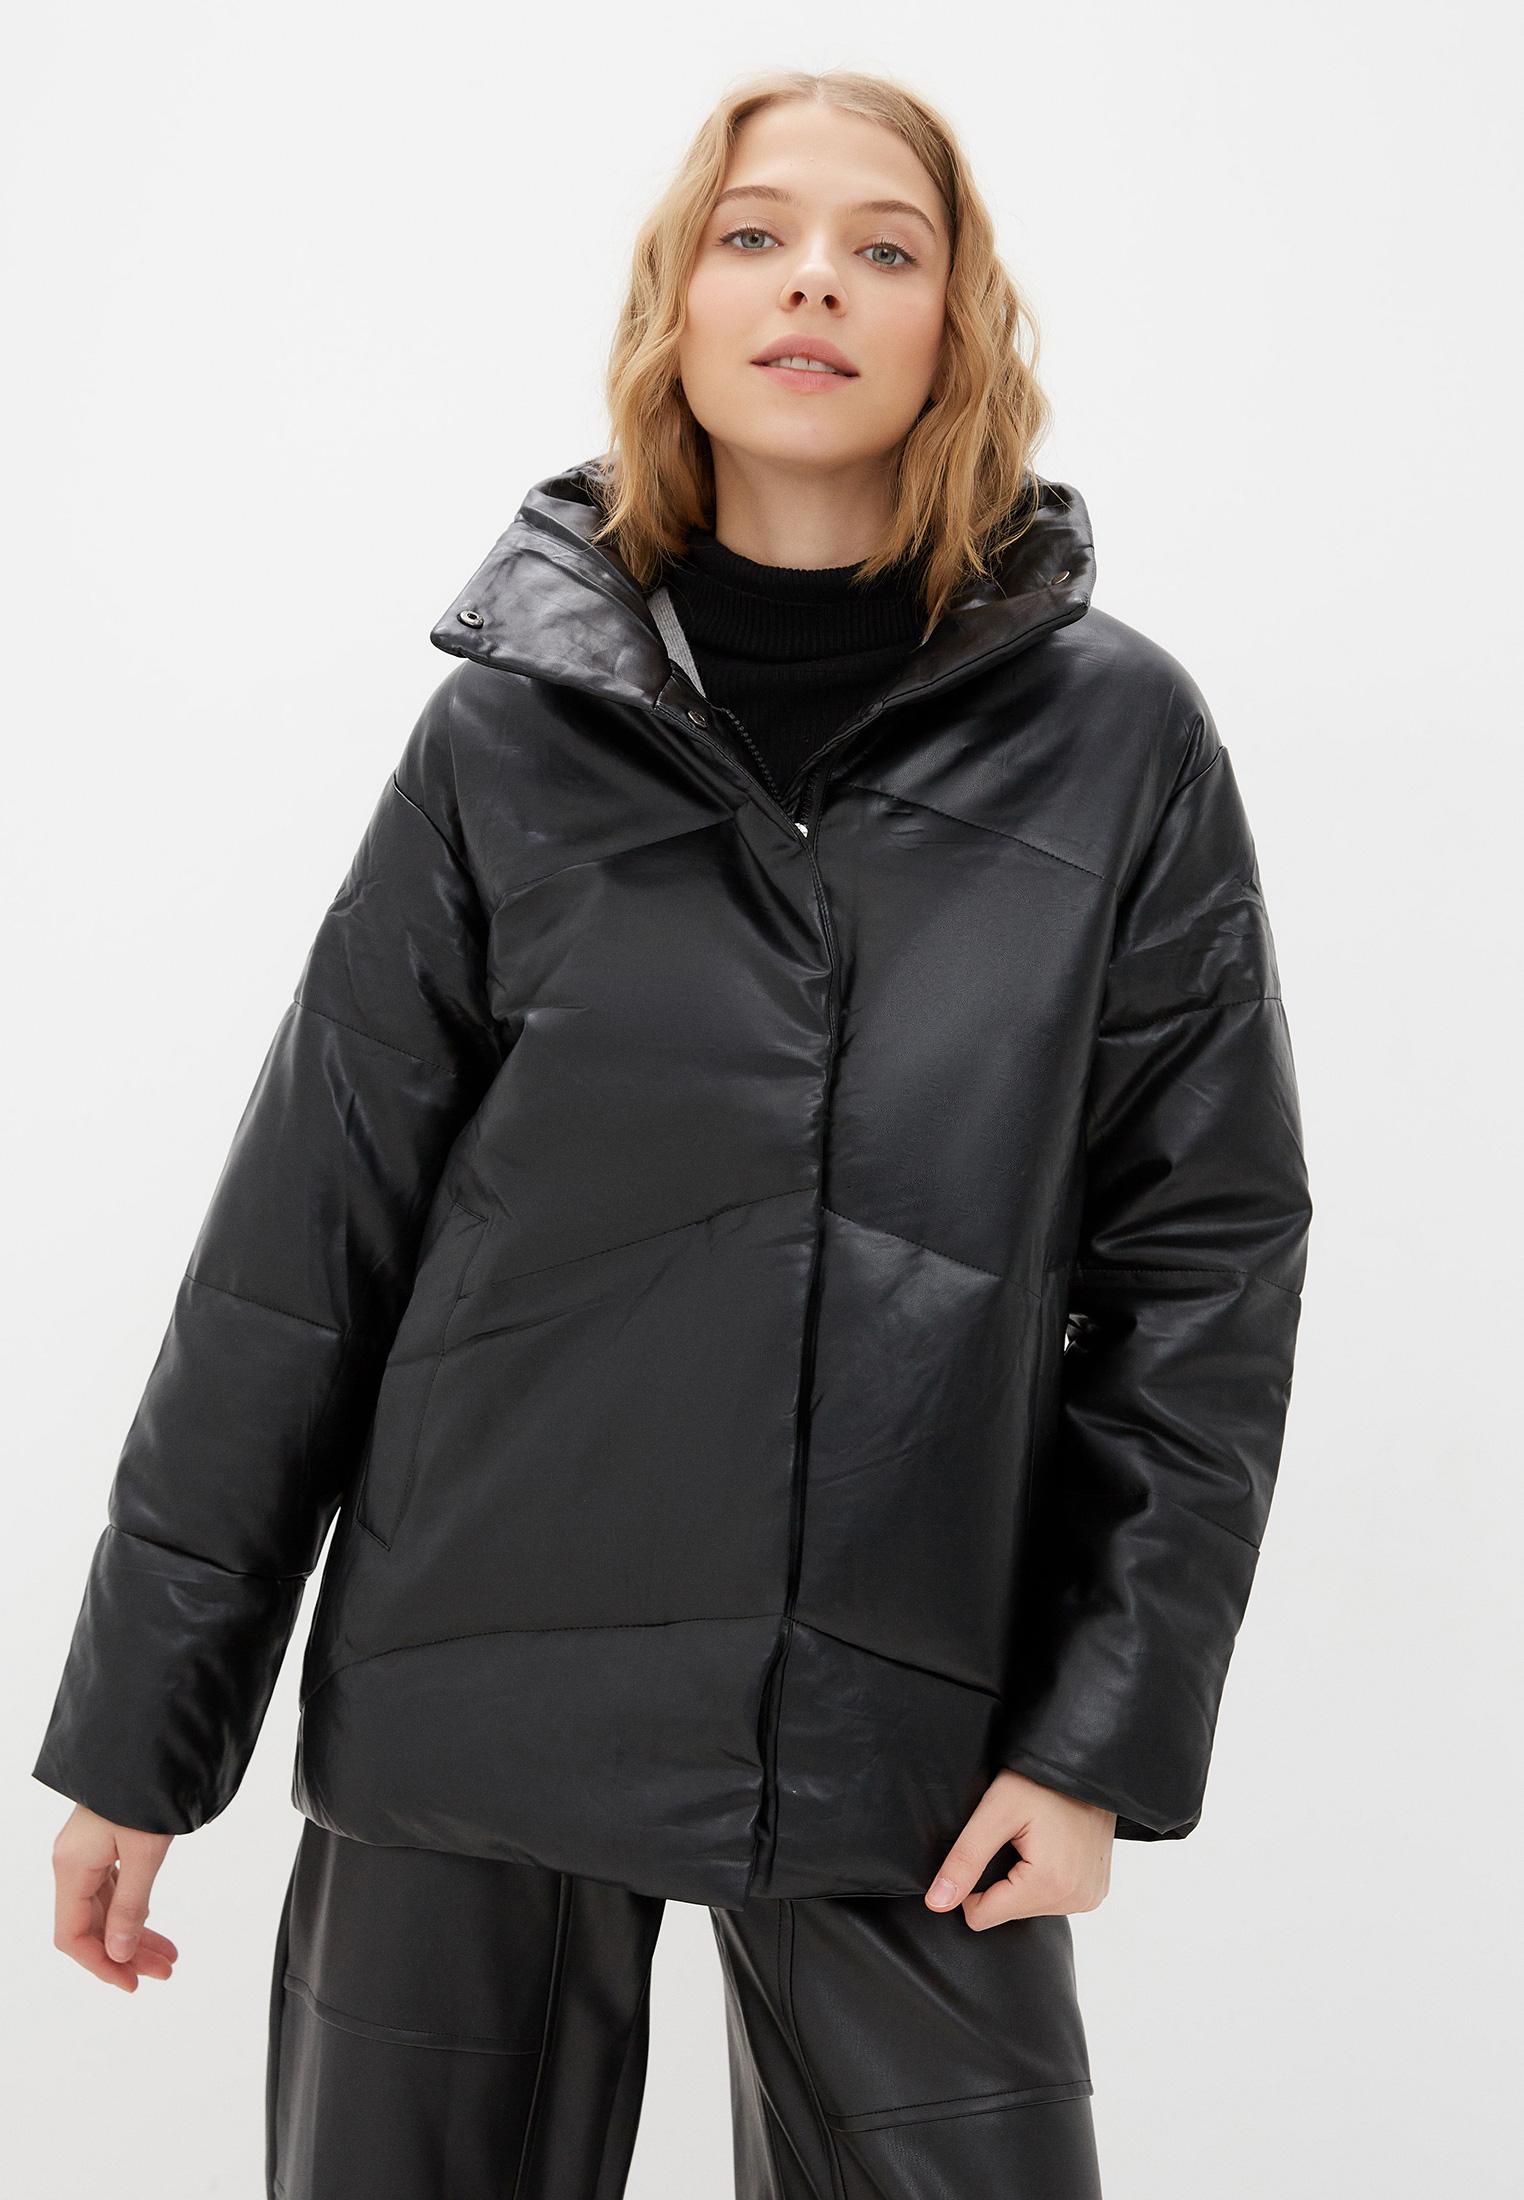 Кожаная куртка Snow Airwolf SA-8727/